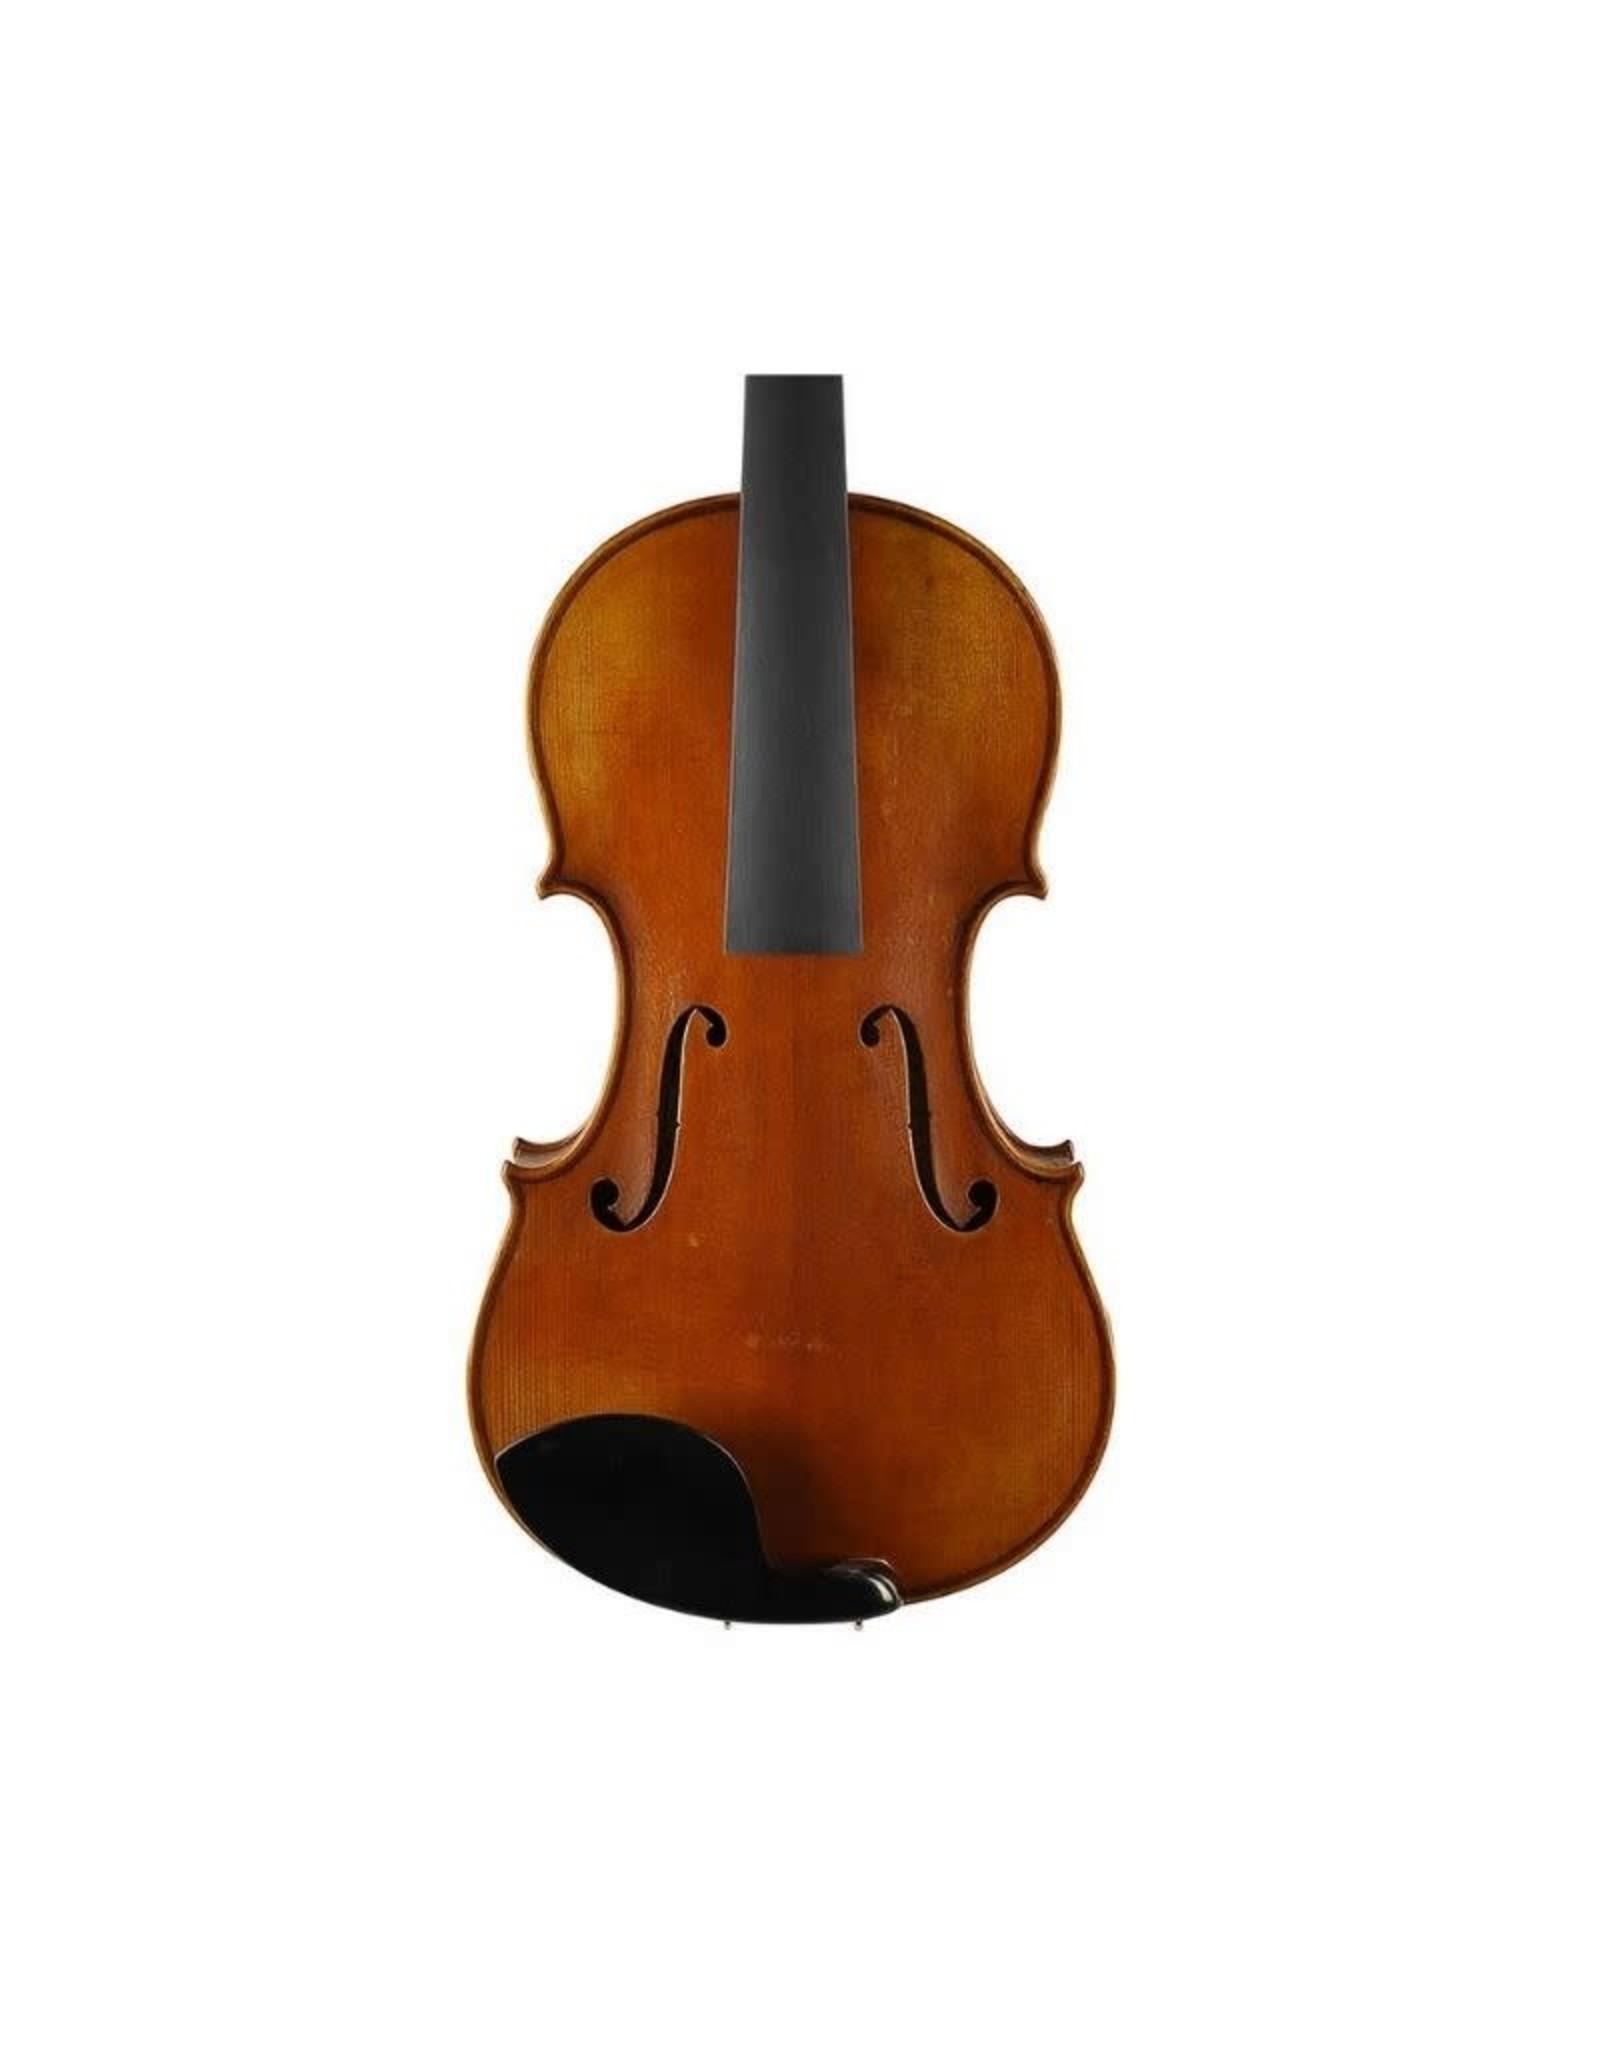 ADVANCED Scott Cao, 4/4 viool, E-KJ, King joseph